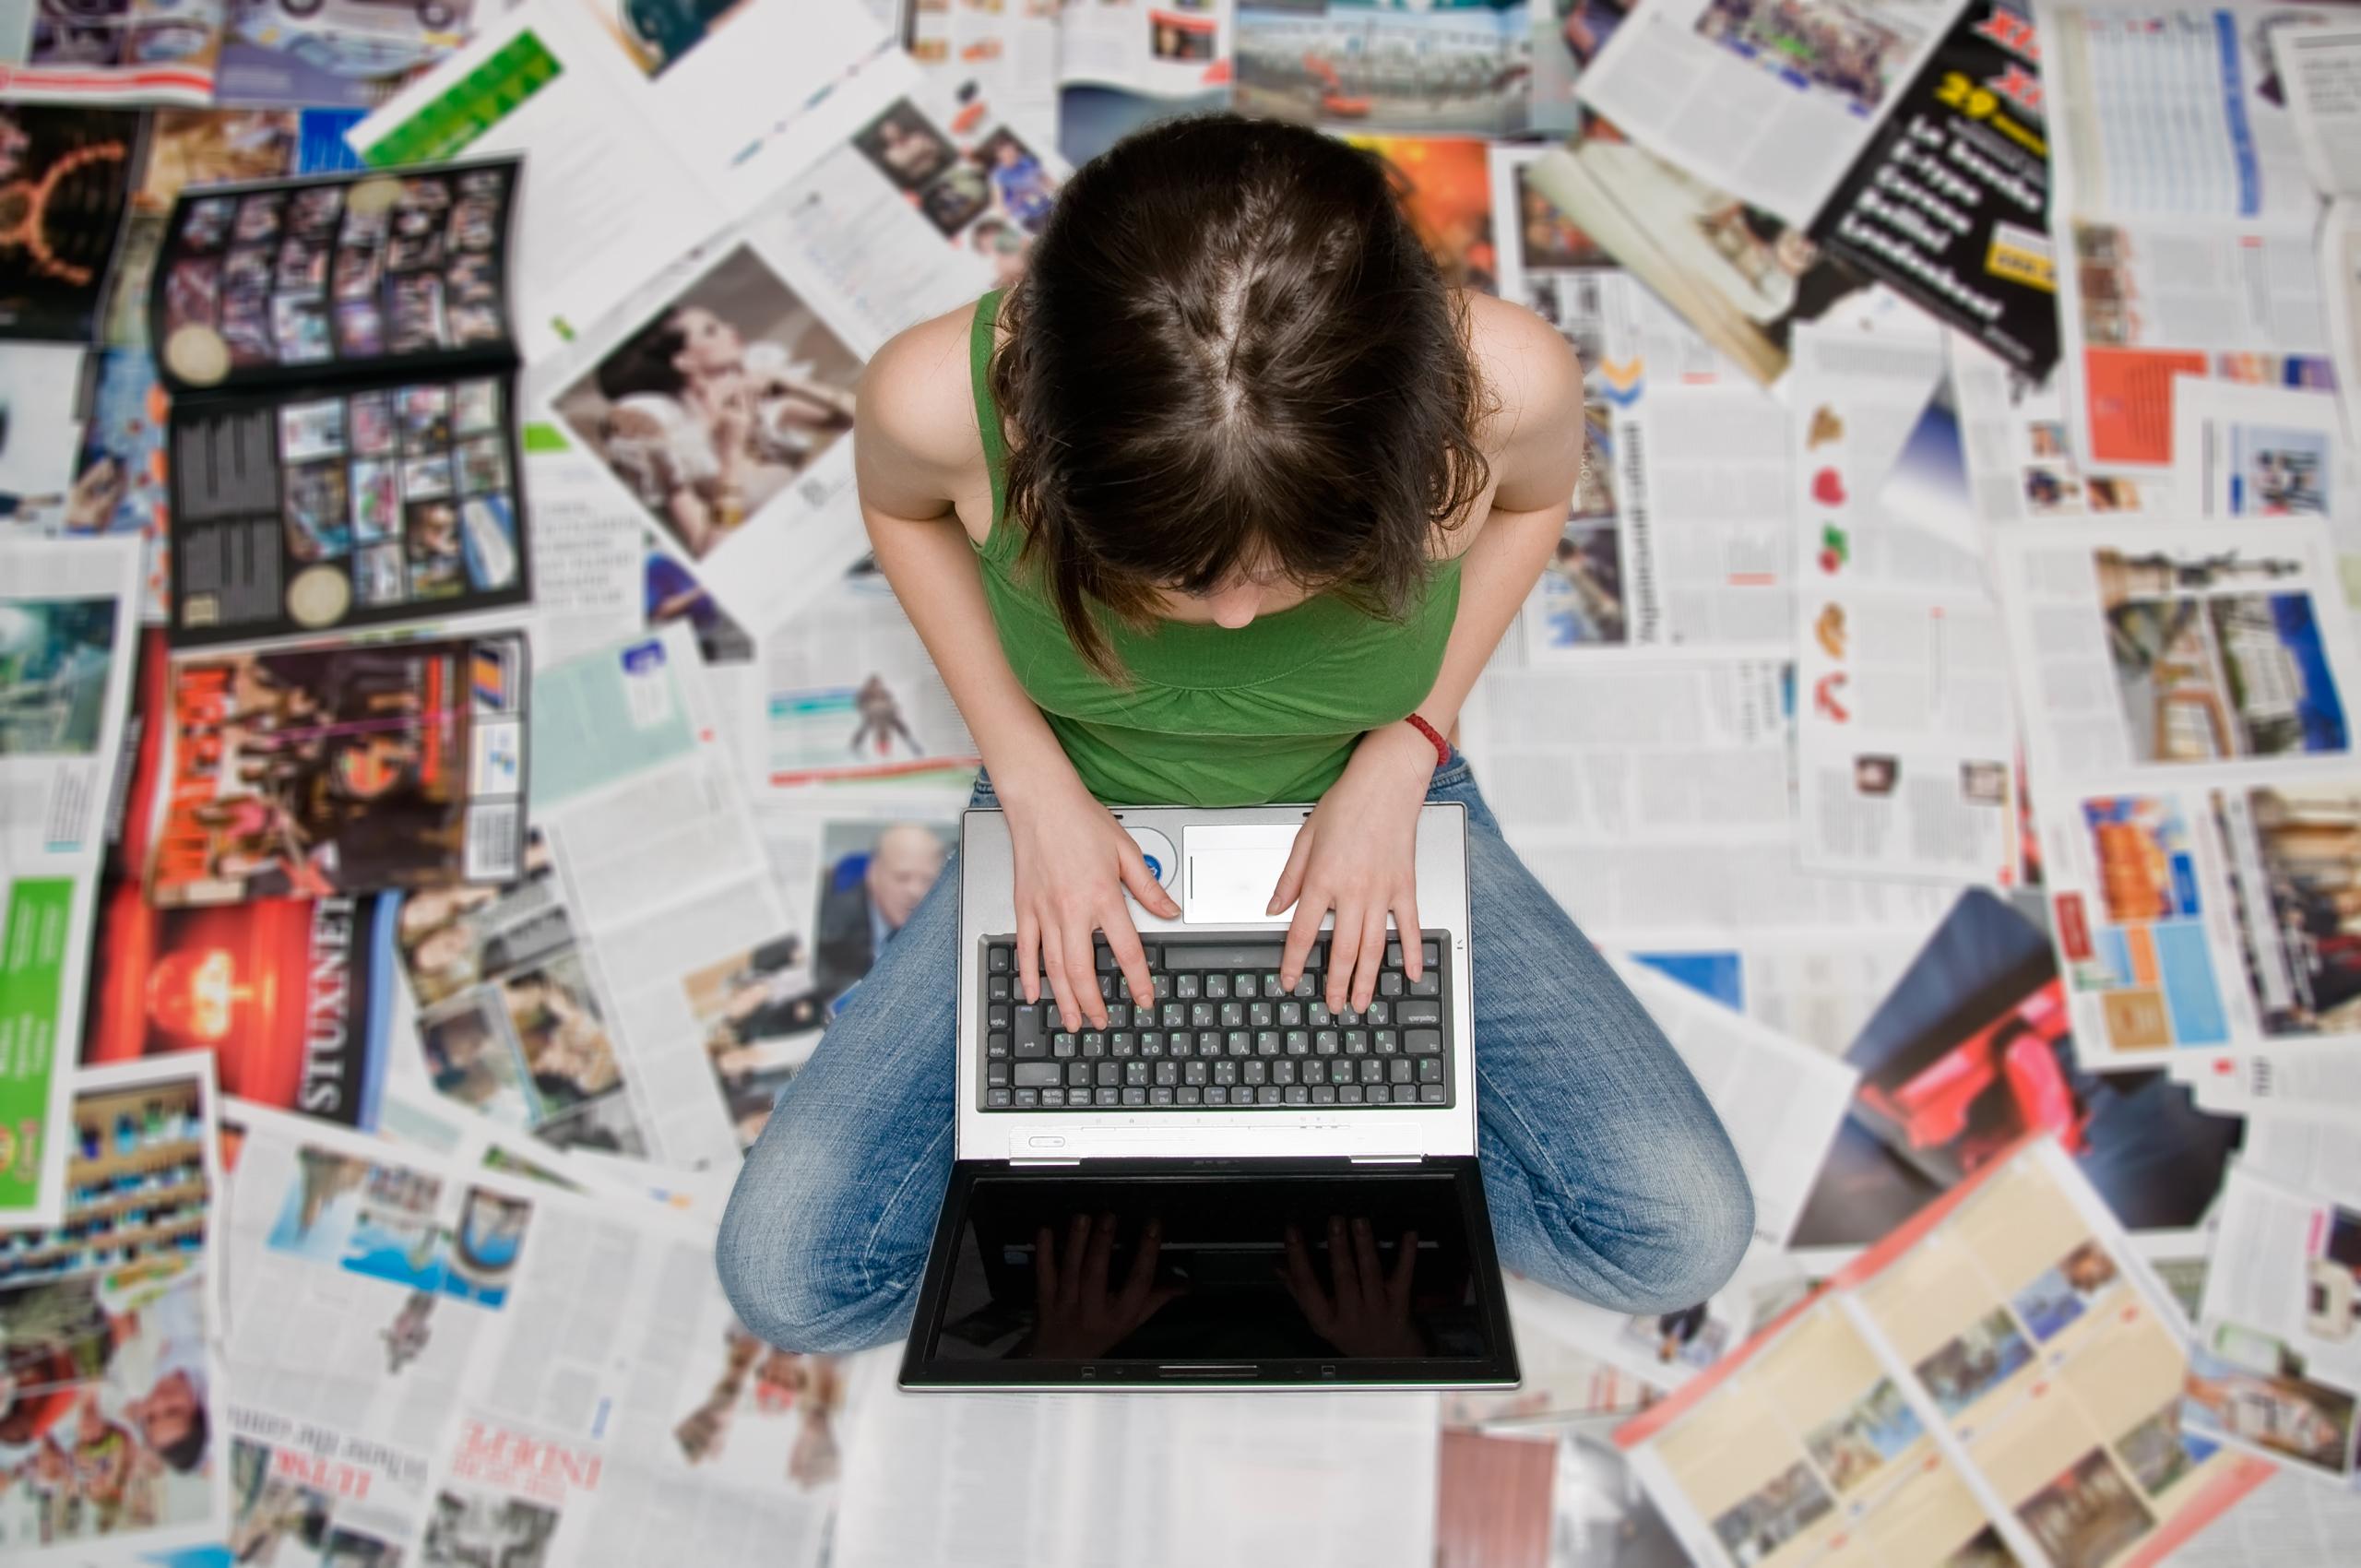 Bild: iStock.com / badahos